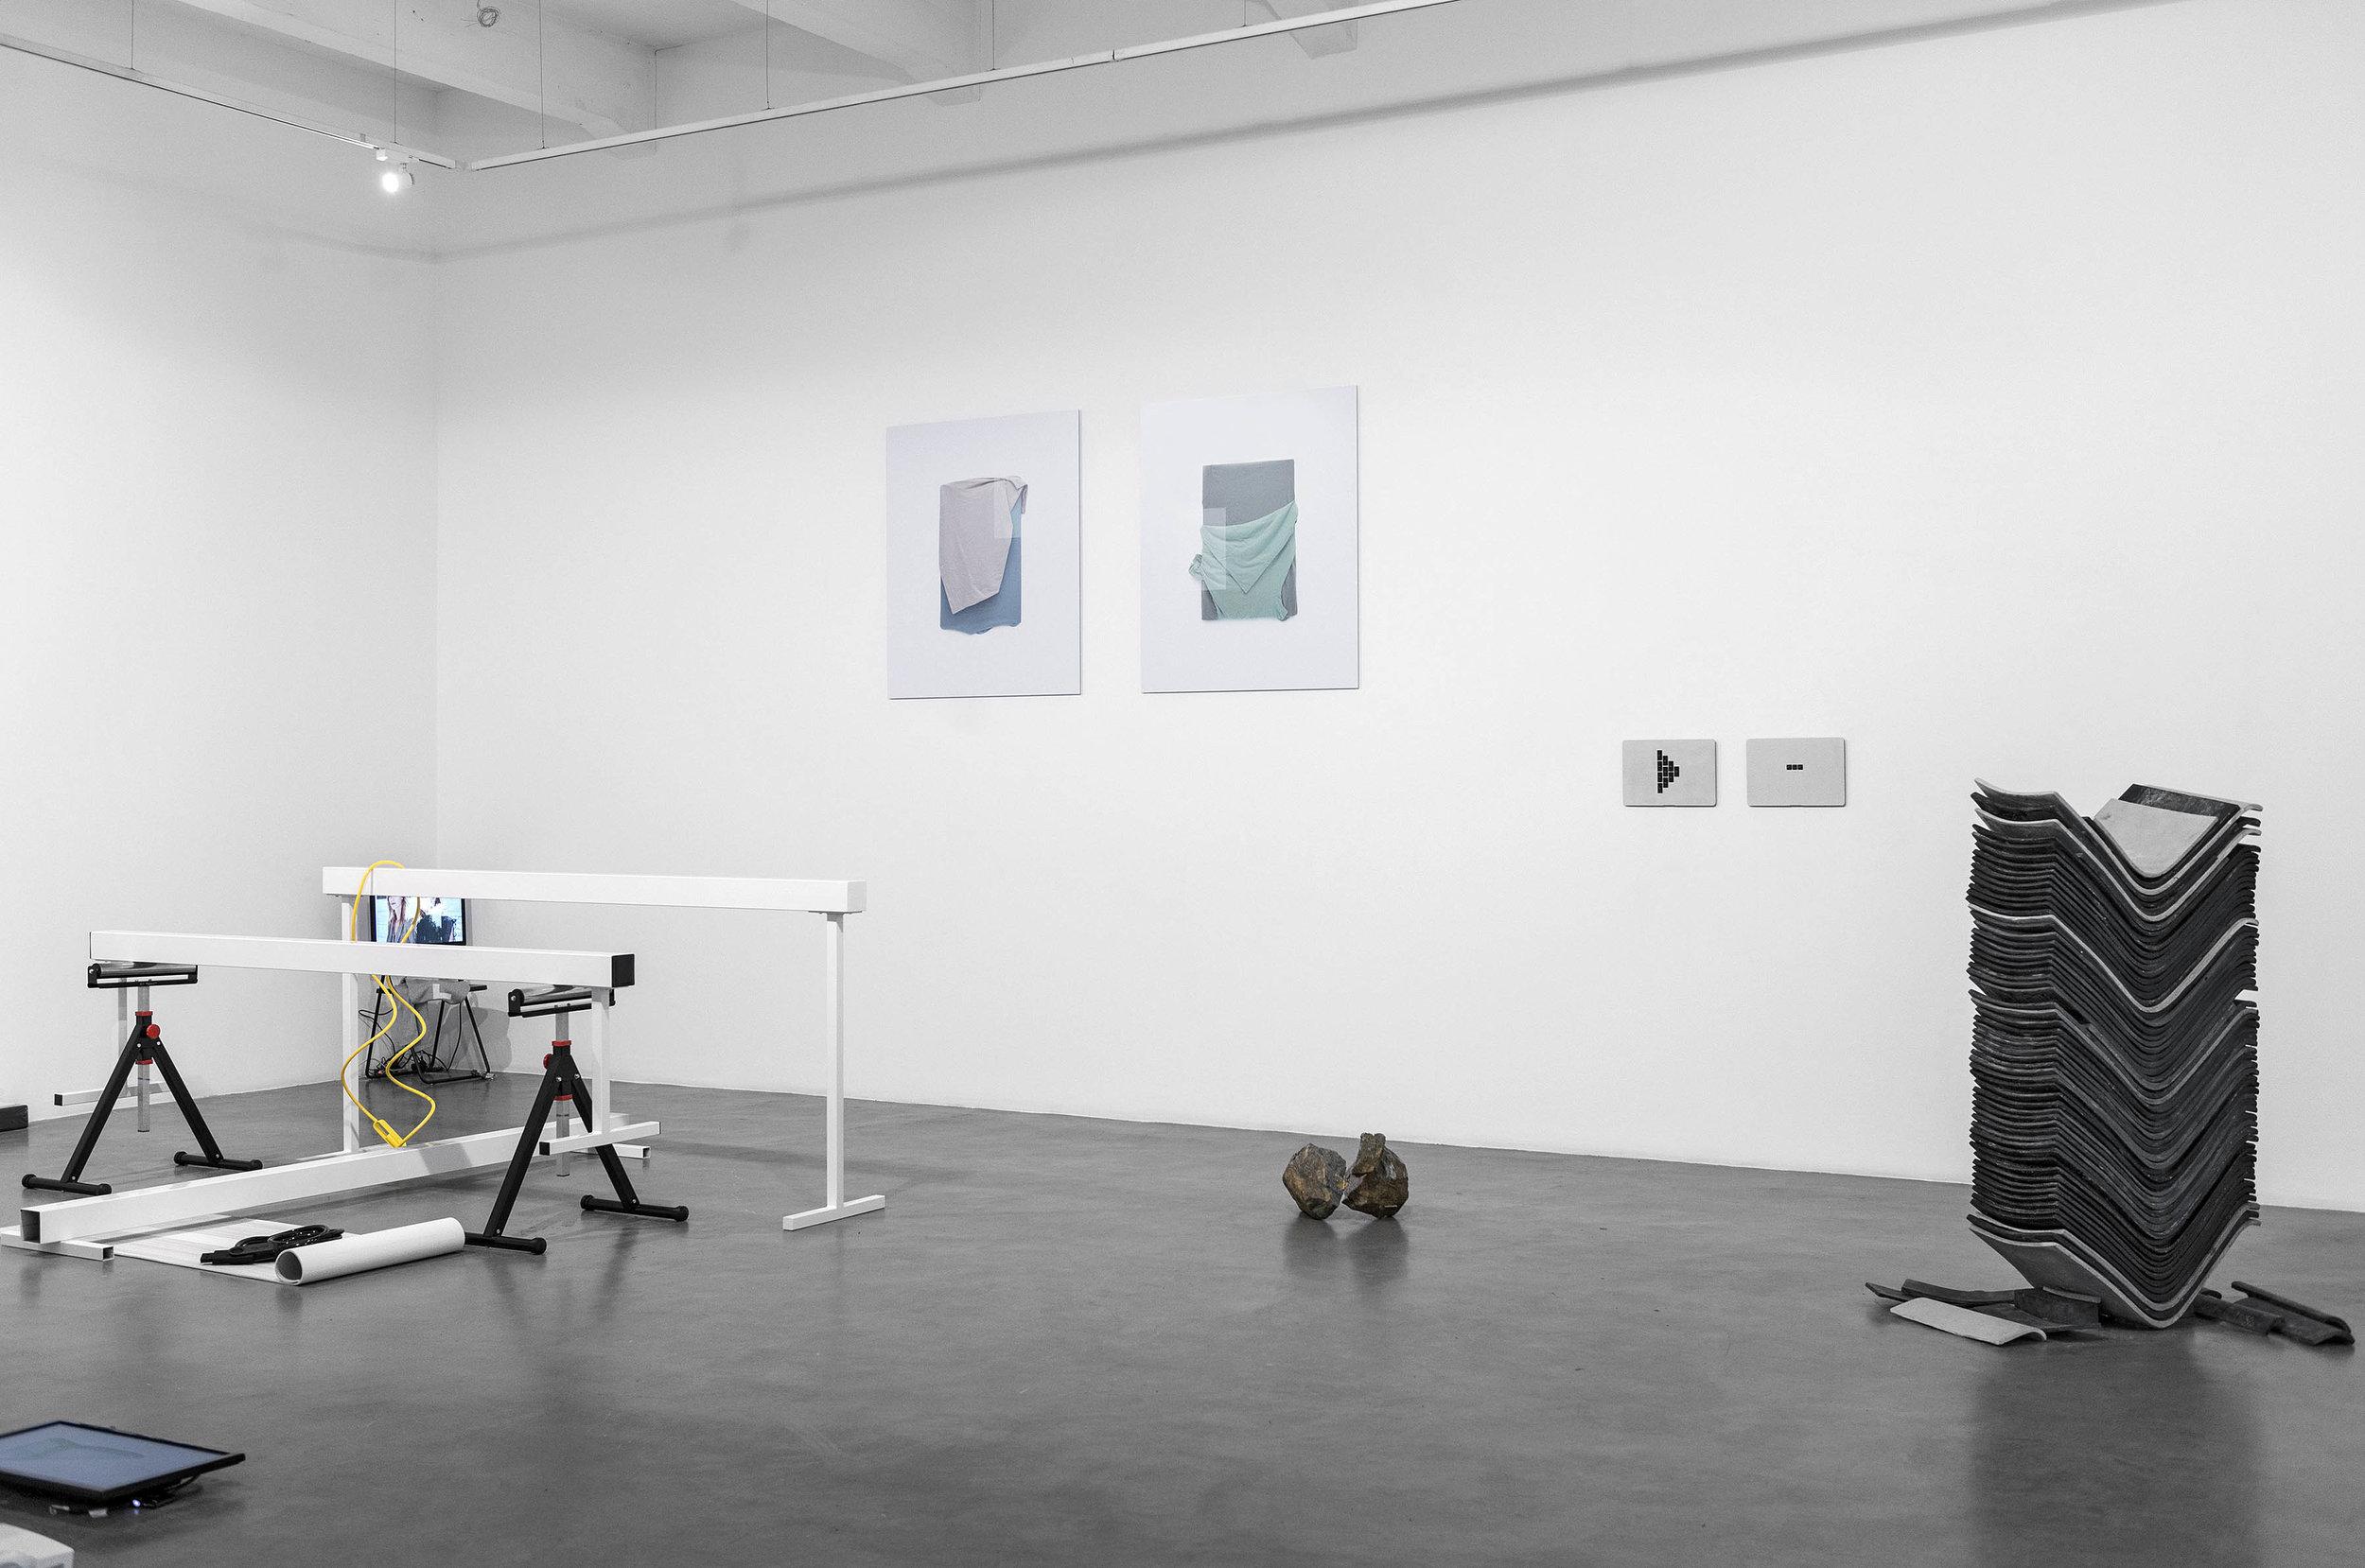 New Material, 2017 installation view. Artists in the show:Robert Cervera,Russell Chater,Marieke Gelissen,Paul Kindersley,Edith Kollath,Tyler Mallison,Nika Neelova,Michaela Zimmer